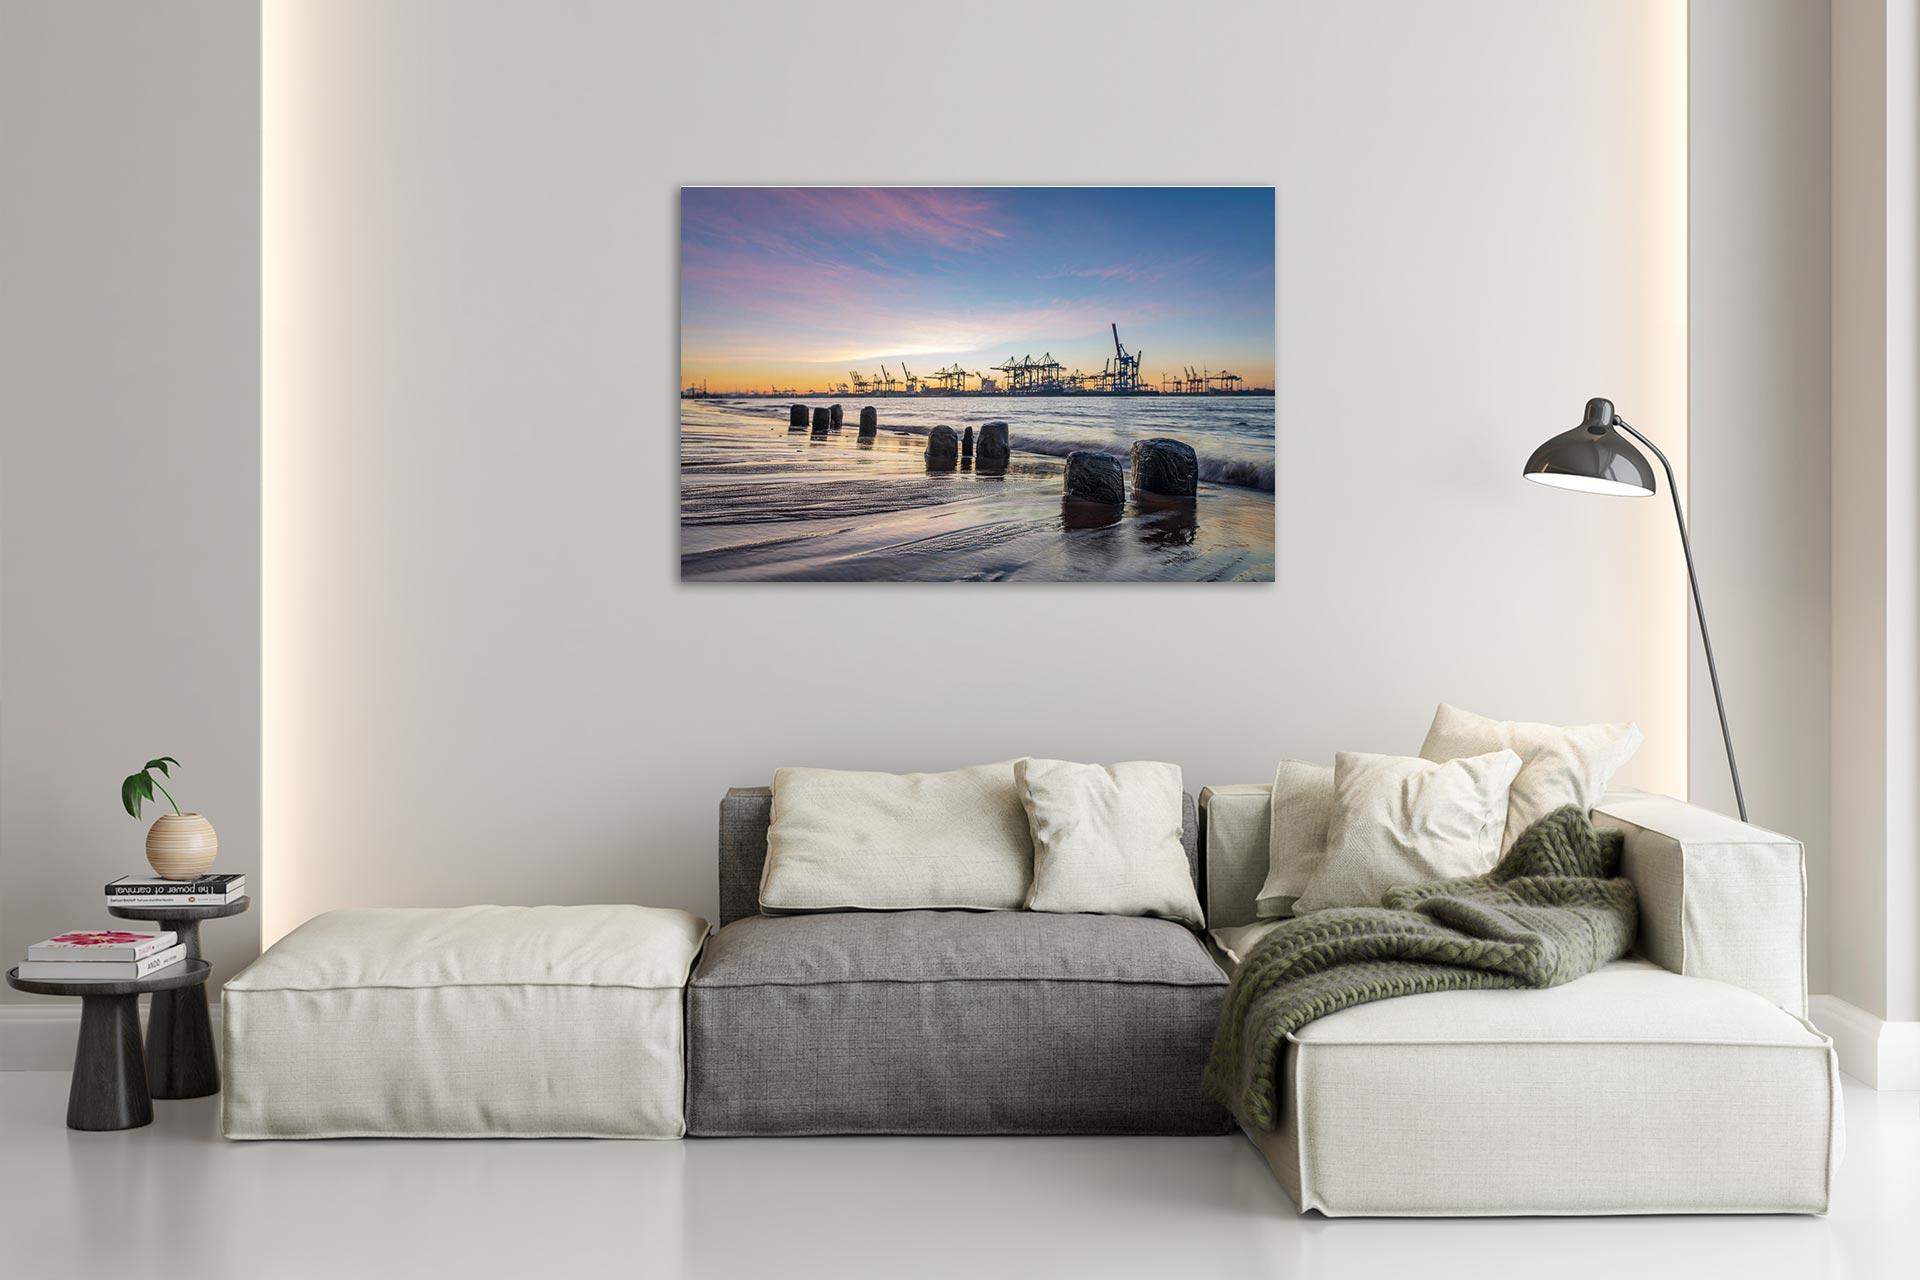 LCW271-dawn-hamburg-wandbild-bild-auf-leinwand-acrylglas-aludibond-wohnzimmer